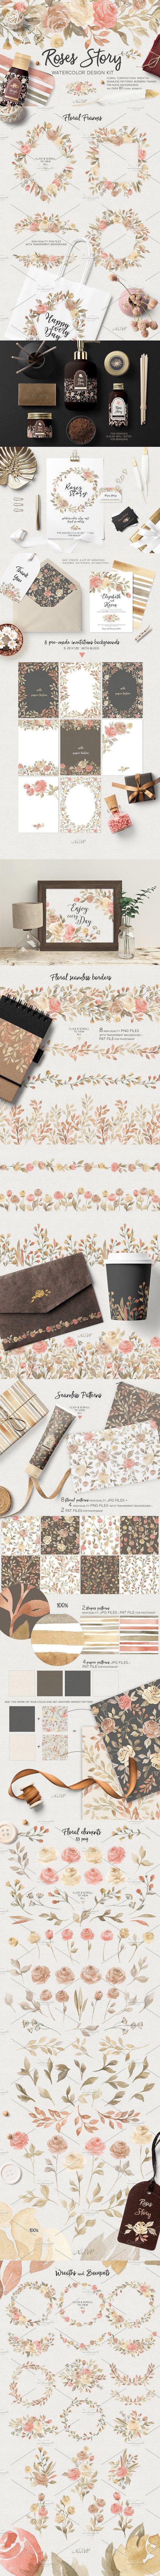 Roses Story Design Kit Watercolor Wedding Card